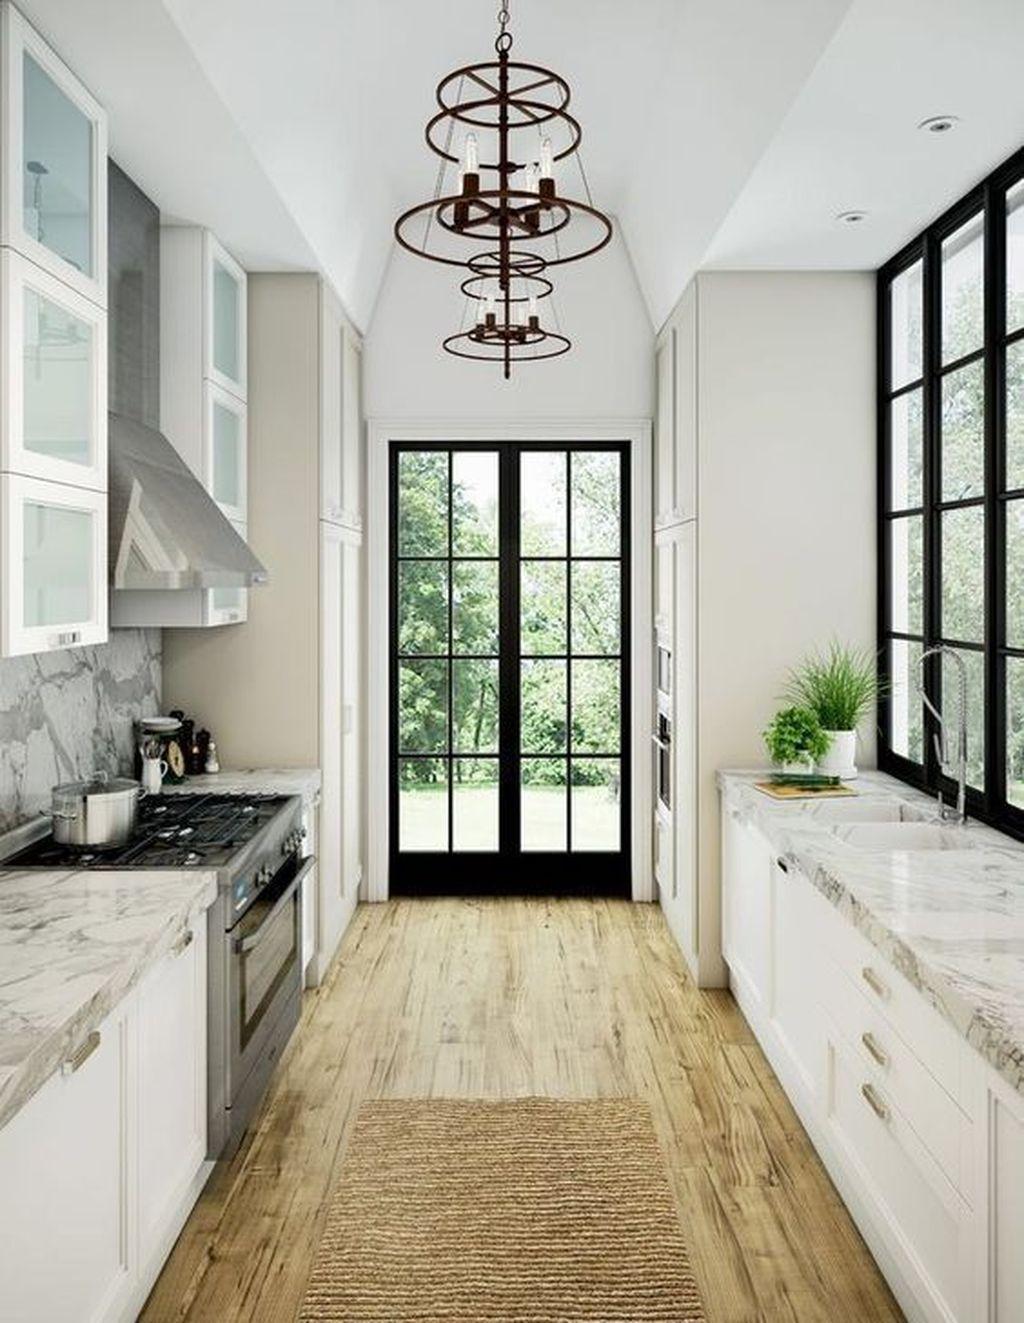 Brilliant Small Kitchen Remodel Design Ideas On A Budget 10